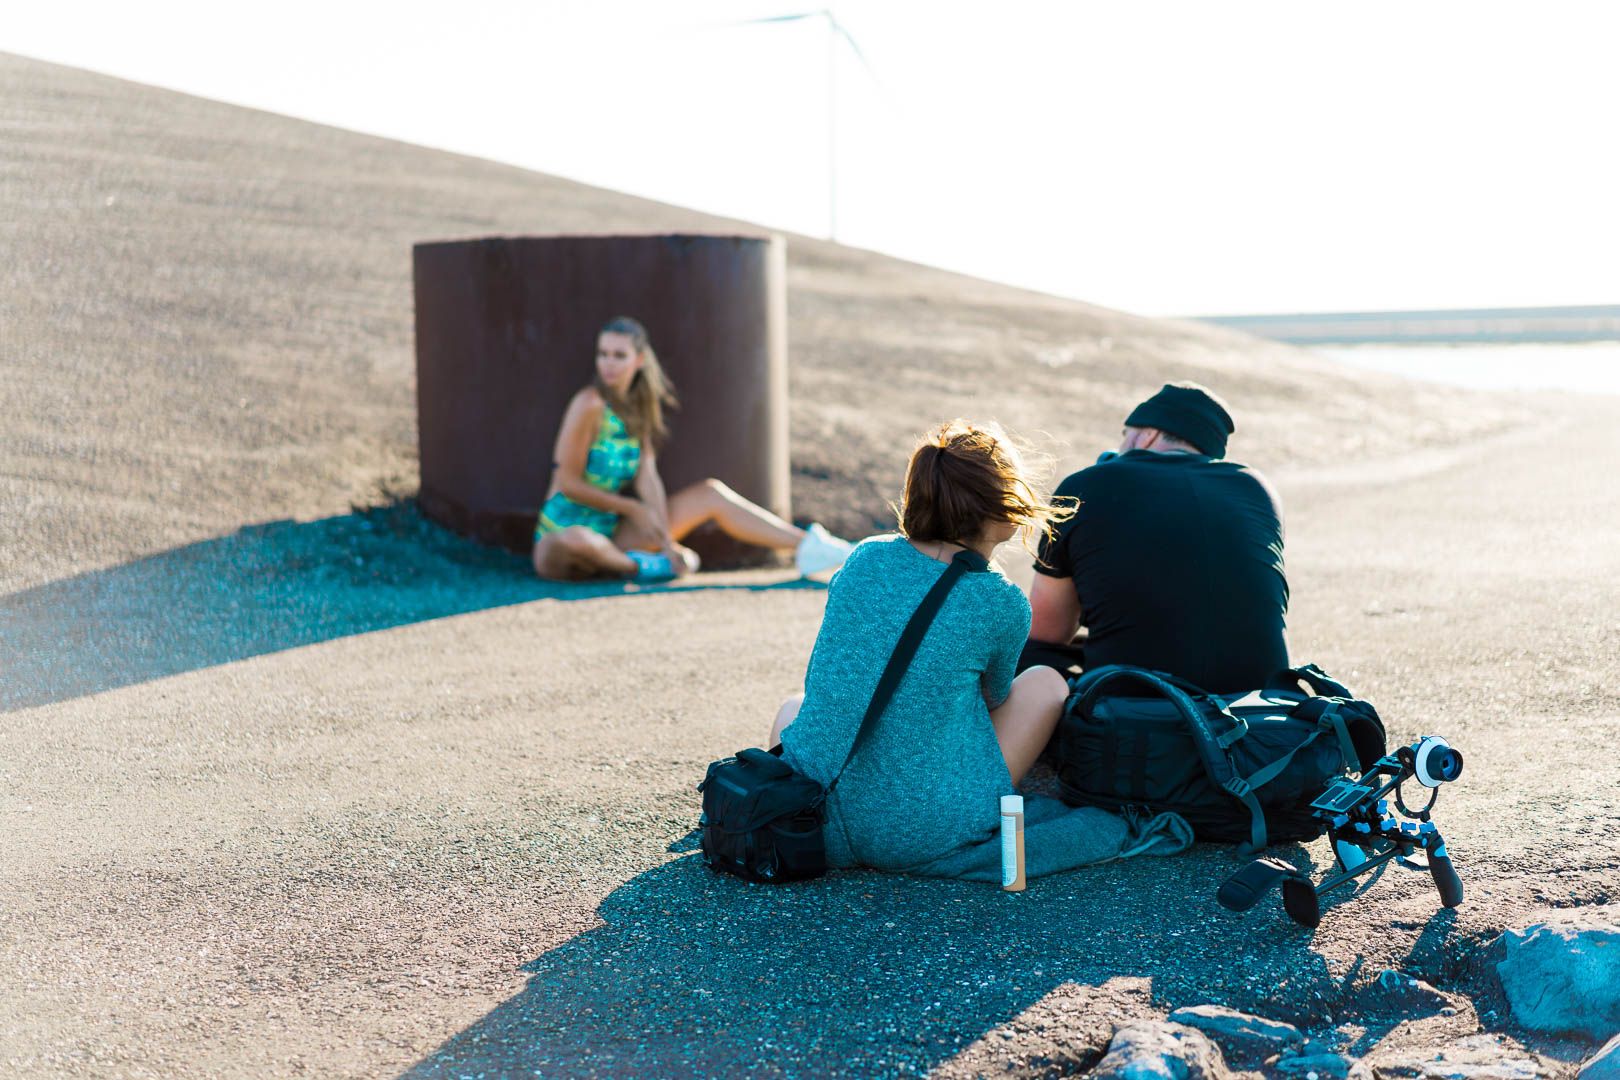 photographer-shooting-editorial-modeling-agency-swimsuit-ipanema-netherlands